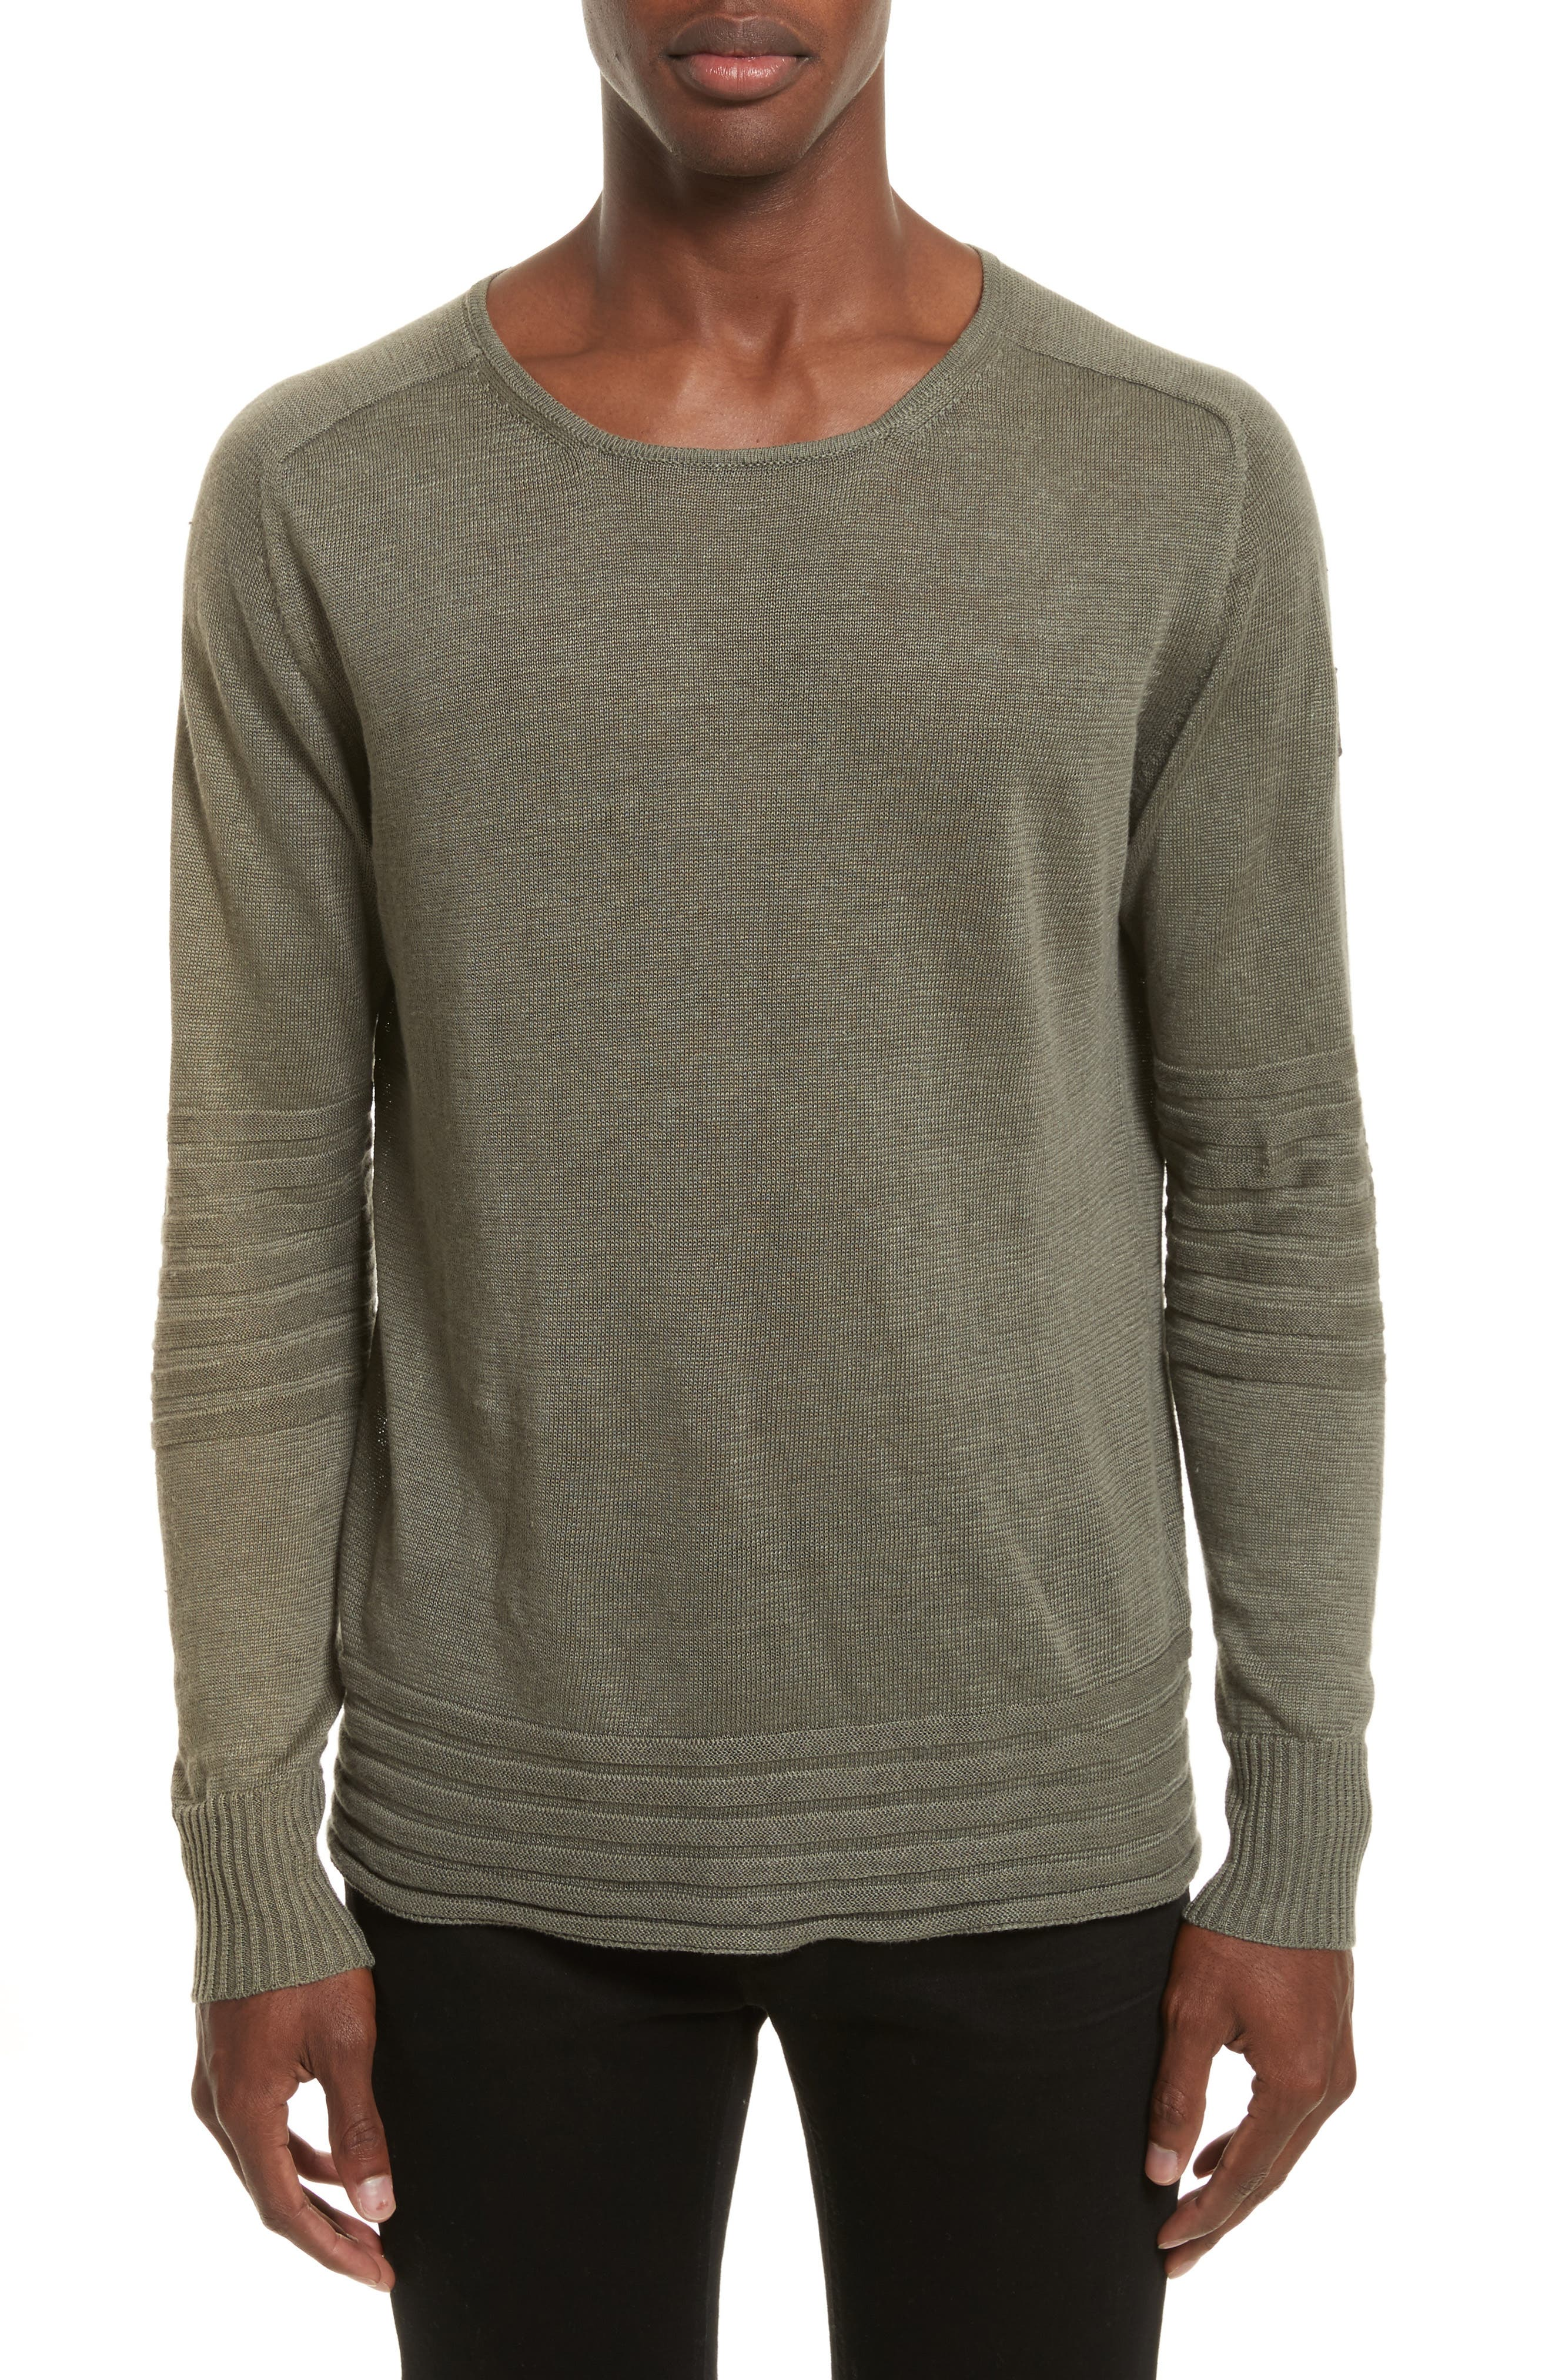 Exford Linen Crewneck Sweater,                         Main,                         color, Slate Green